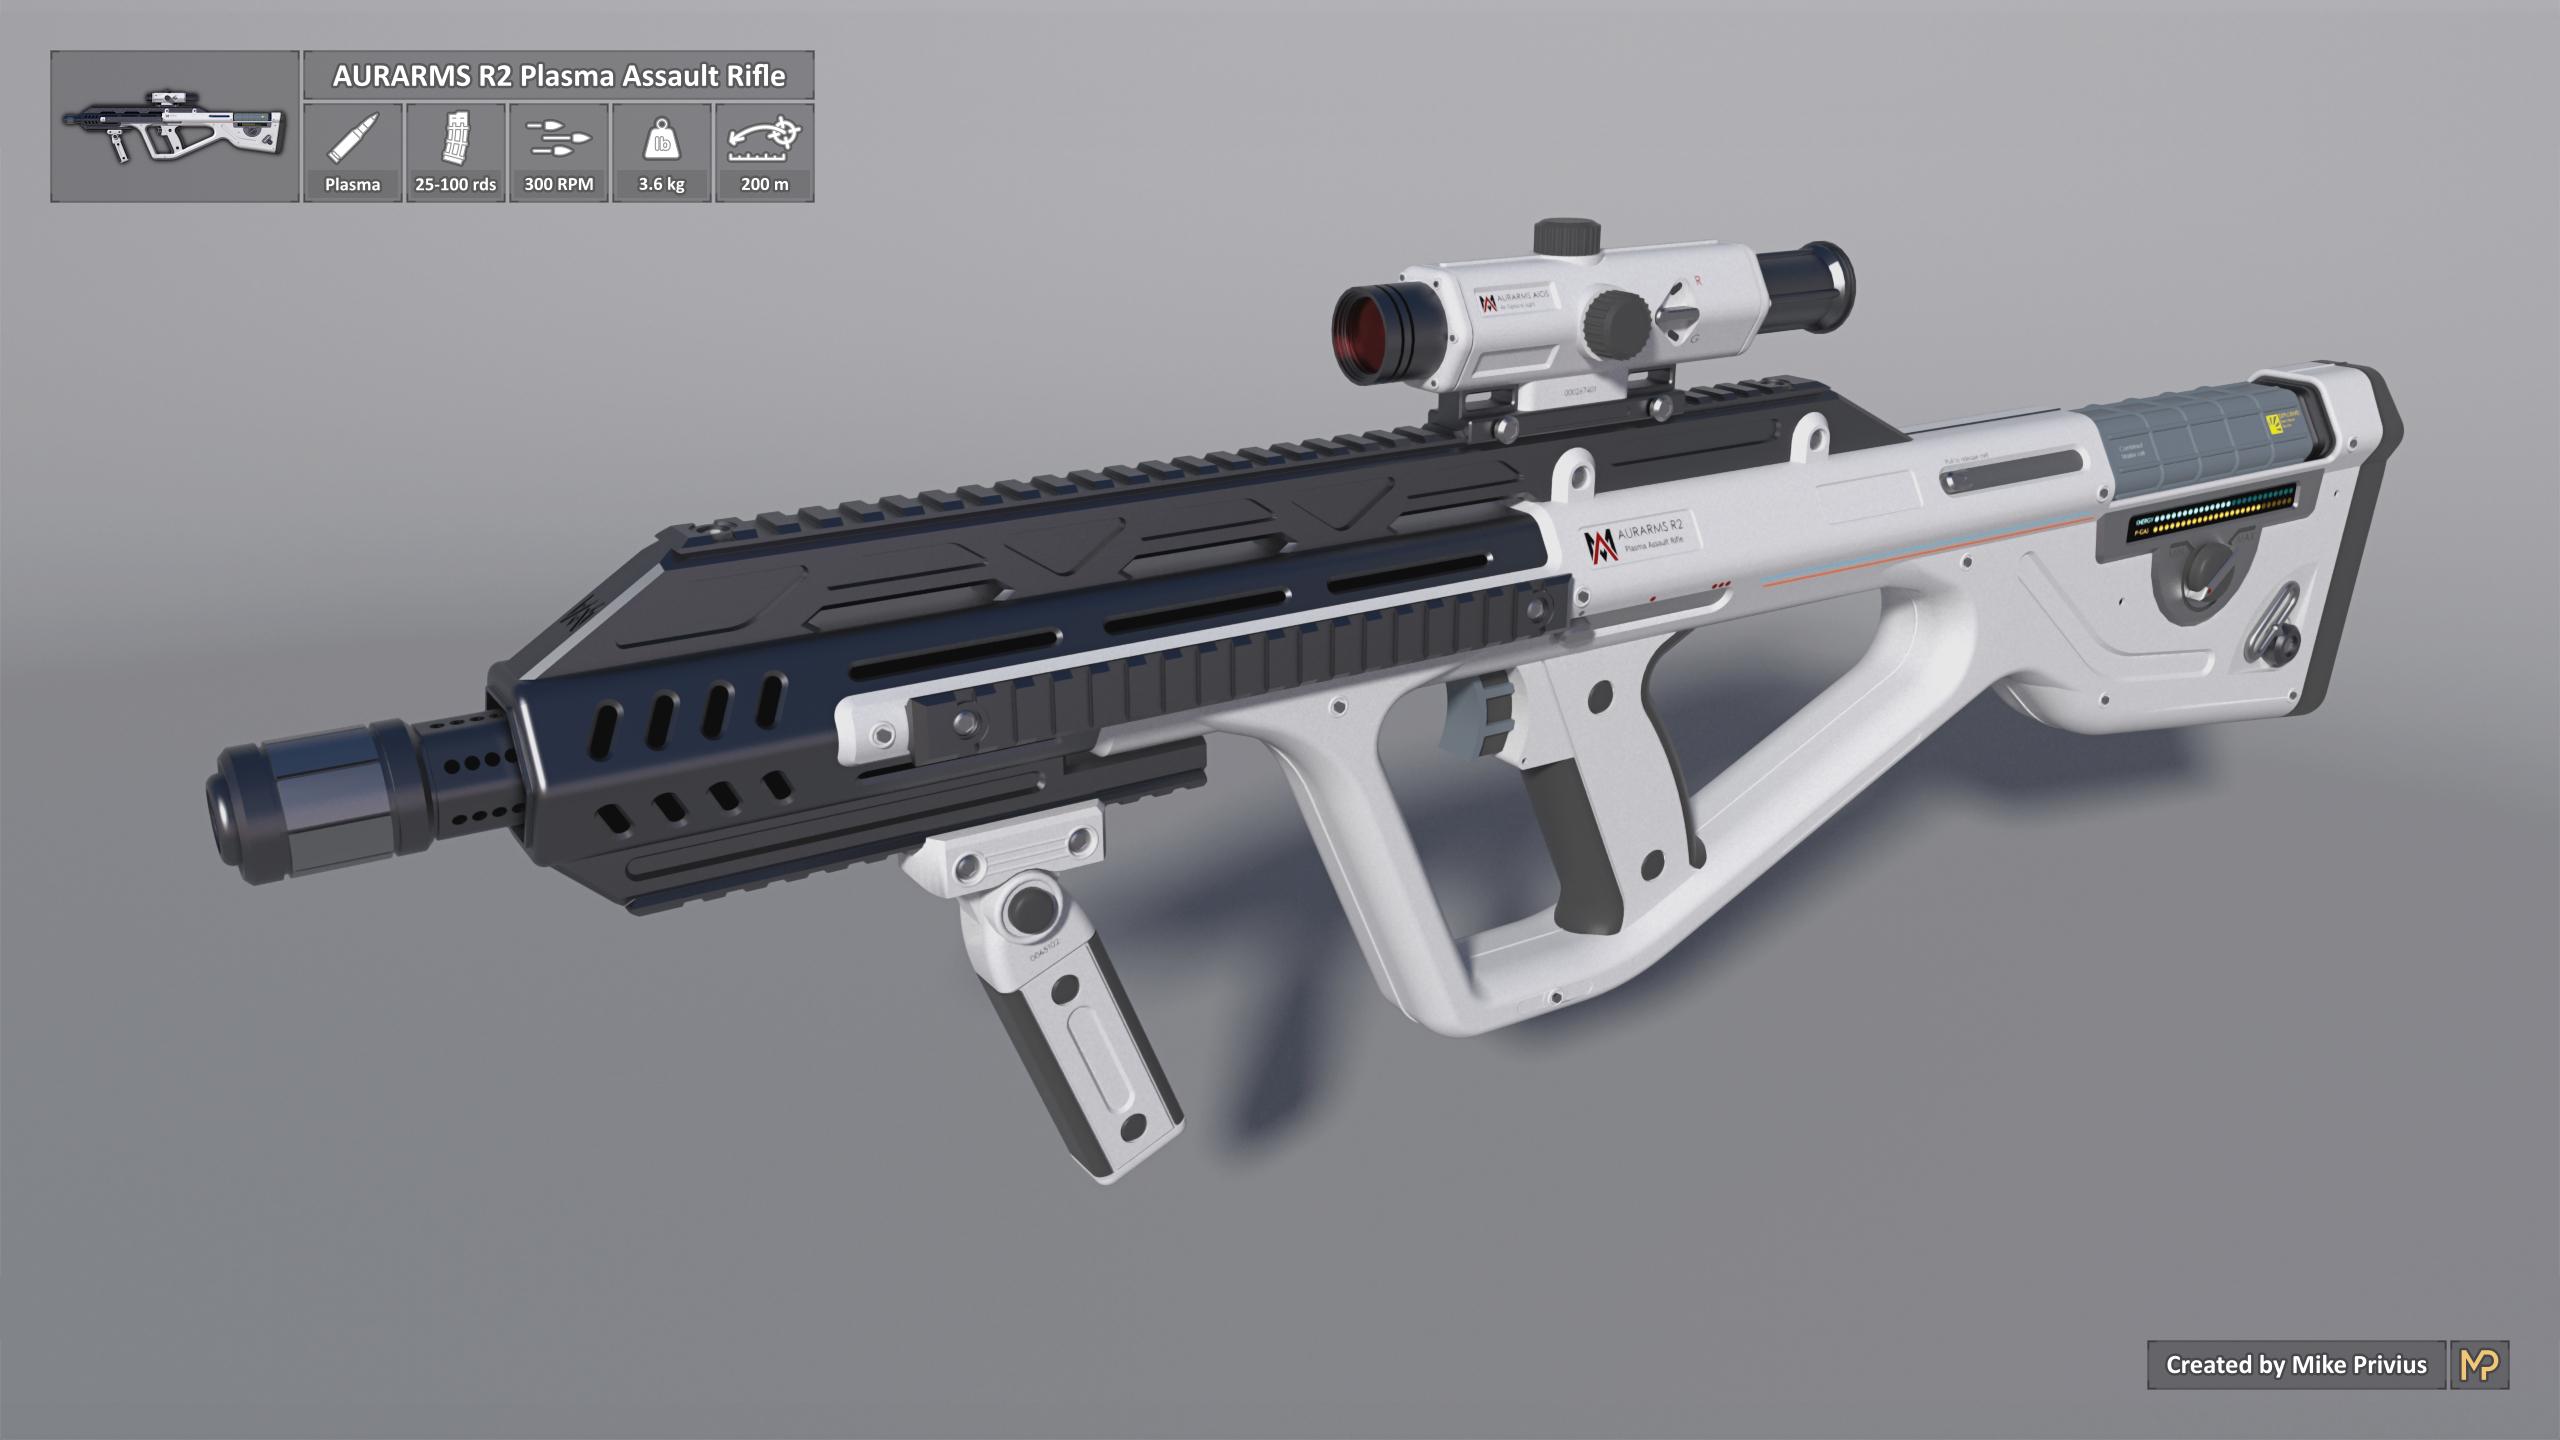 [SketchUp] AURARMS R2 Plasma Assault Rifle